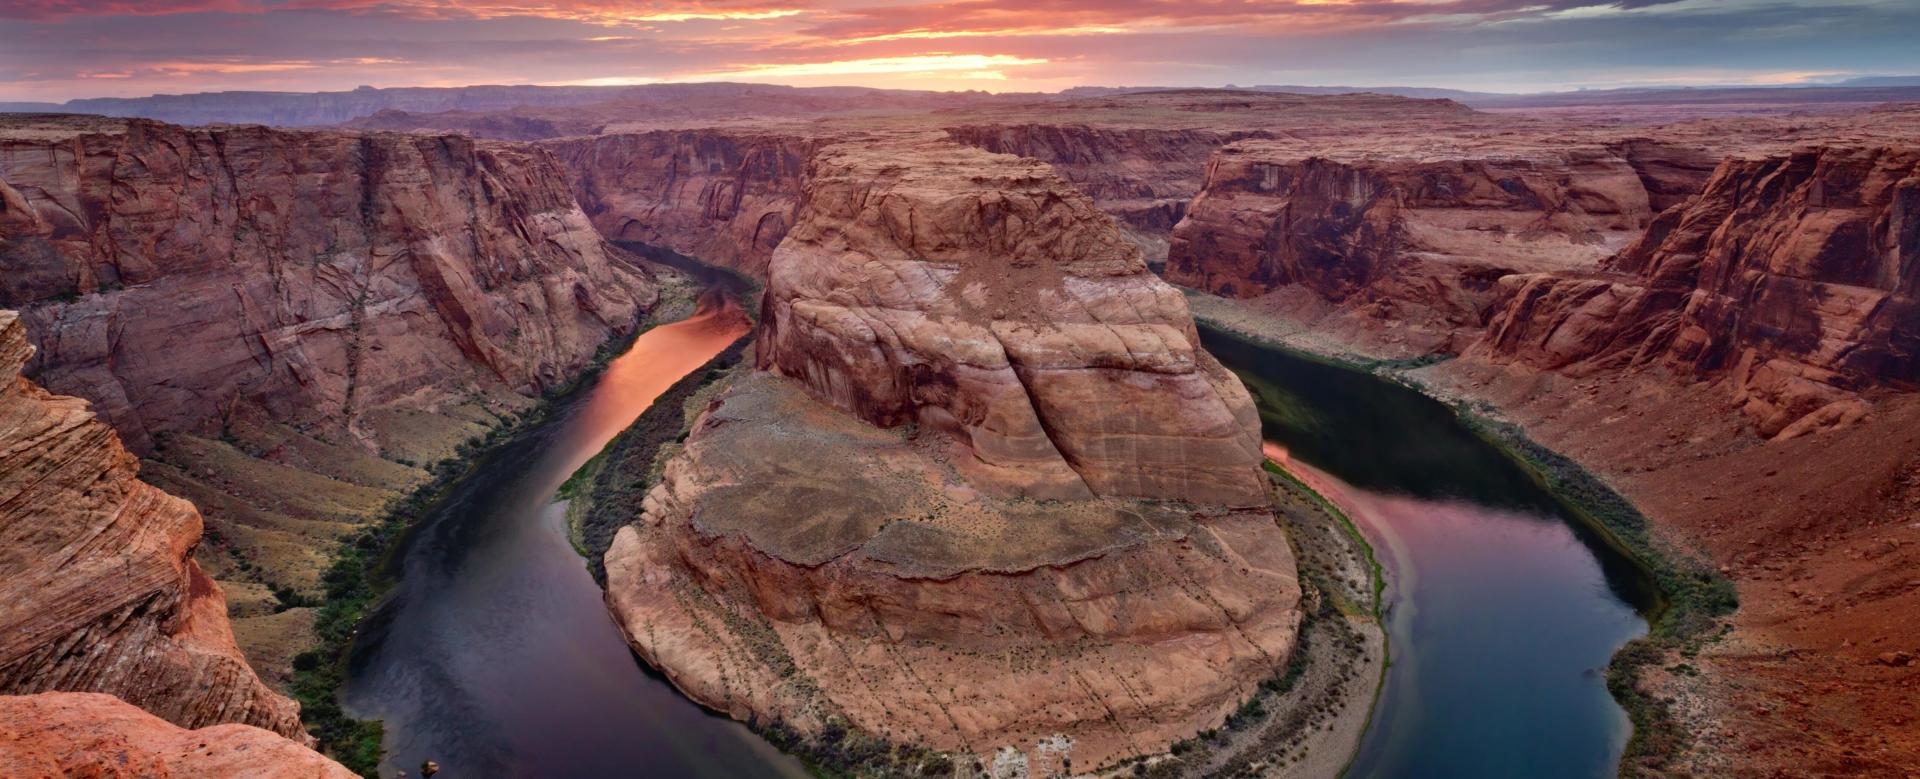 Trekking États-Unis : Les parcs mythiques confort